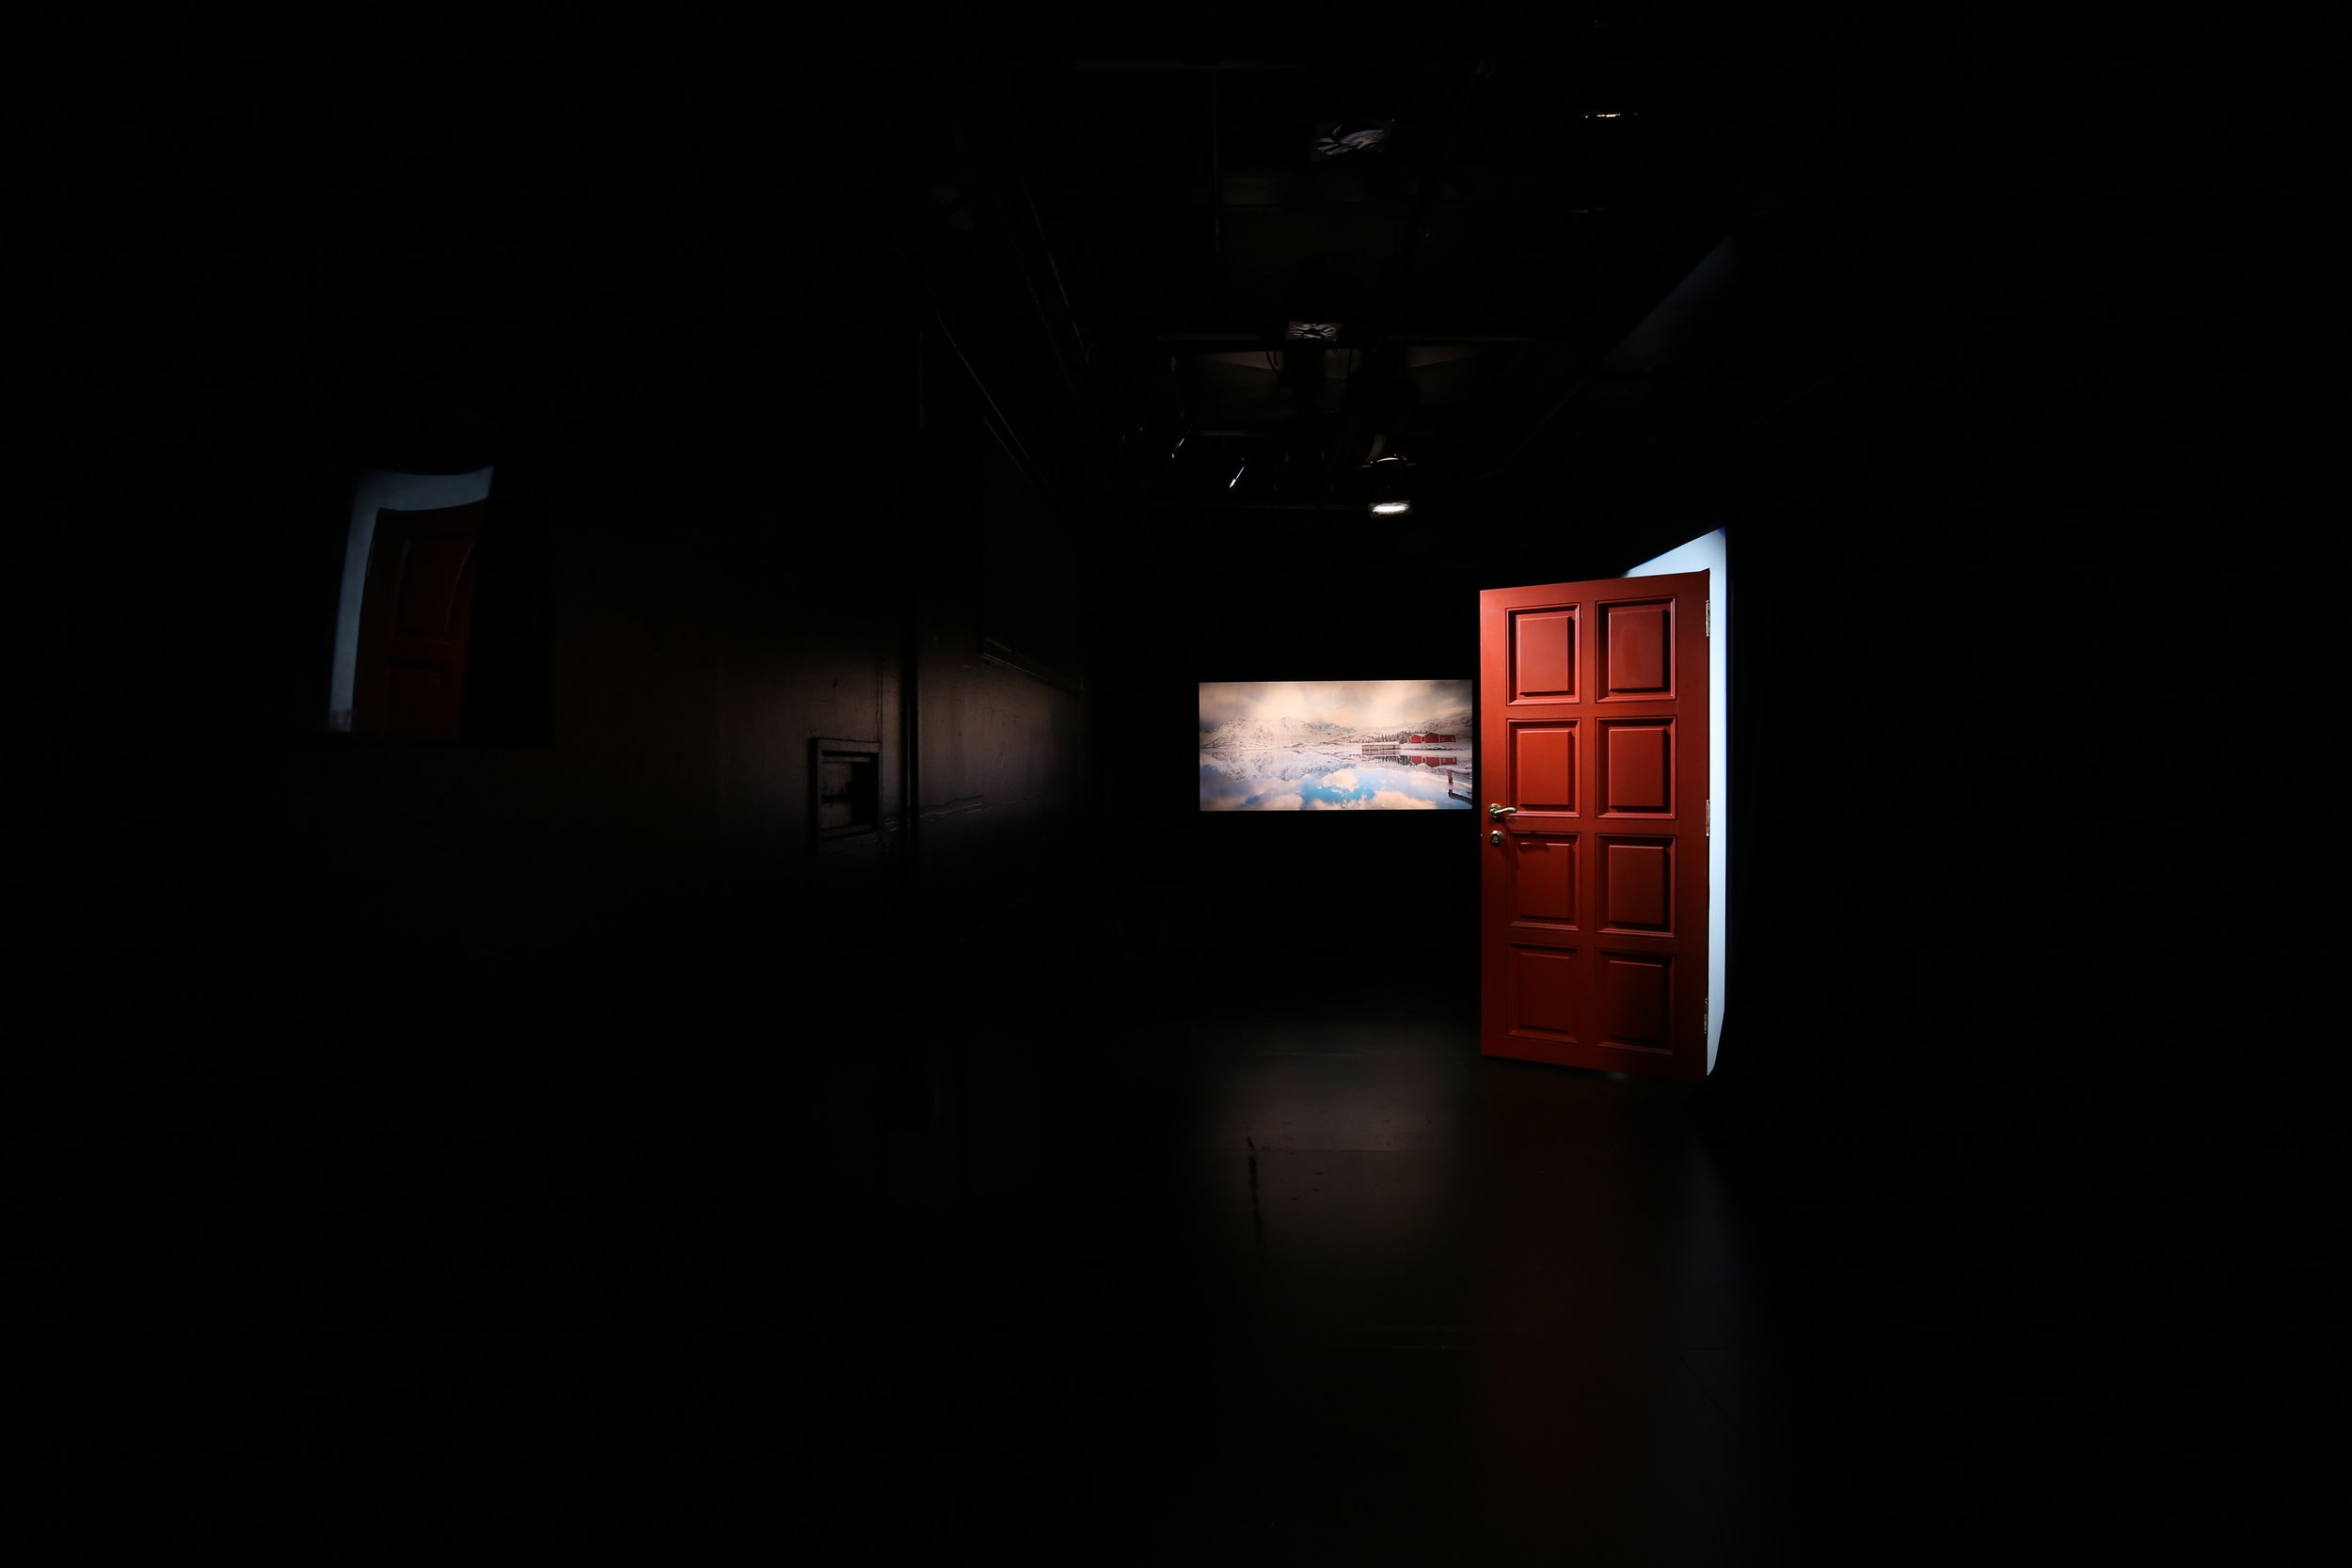 A Doll_s House, part 2, 02-2019, WIDE, photo by Ella Bromblin (1).JPG